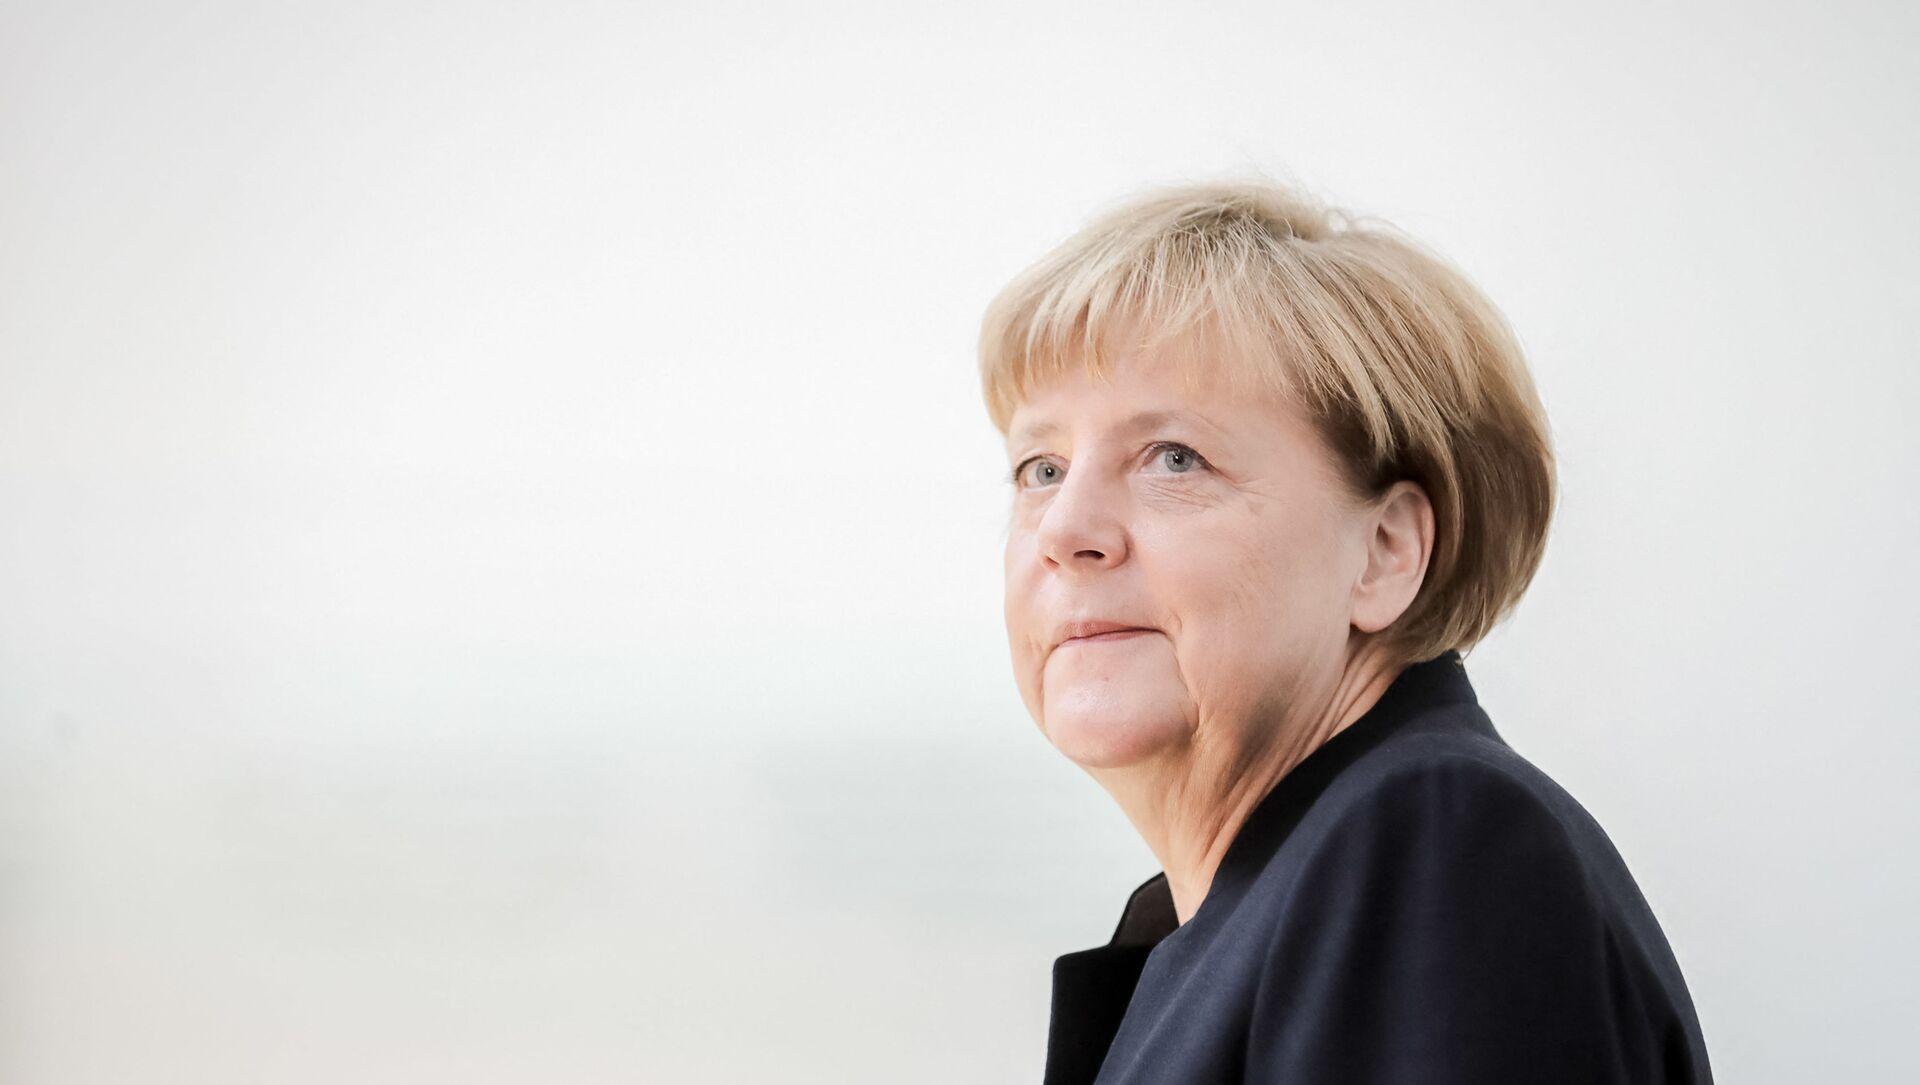 German Chancellor Angela Merkel arrives at the Israeli embassy in Berlin to sign the book of condolence for Israeli ex-president and Nobel Peace Prize winner Shimon Peres on September 30, 2016. - Sputnik International, 1920, 03.08.2021